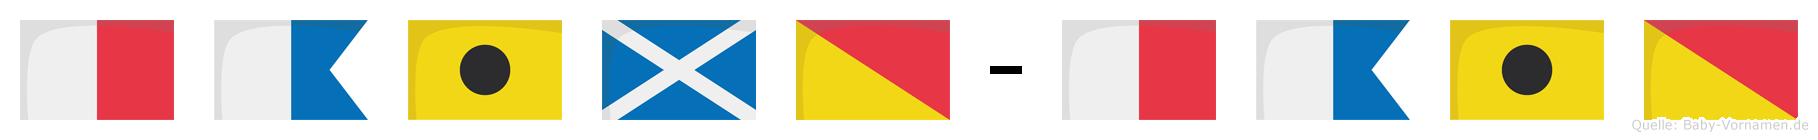 Haimo-Haio im Flaggenalphabet